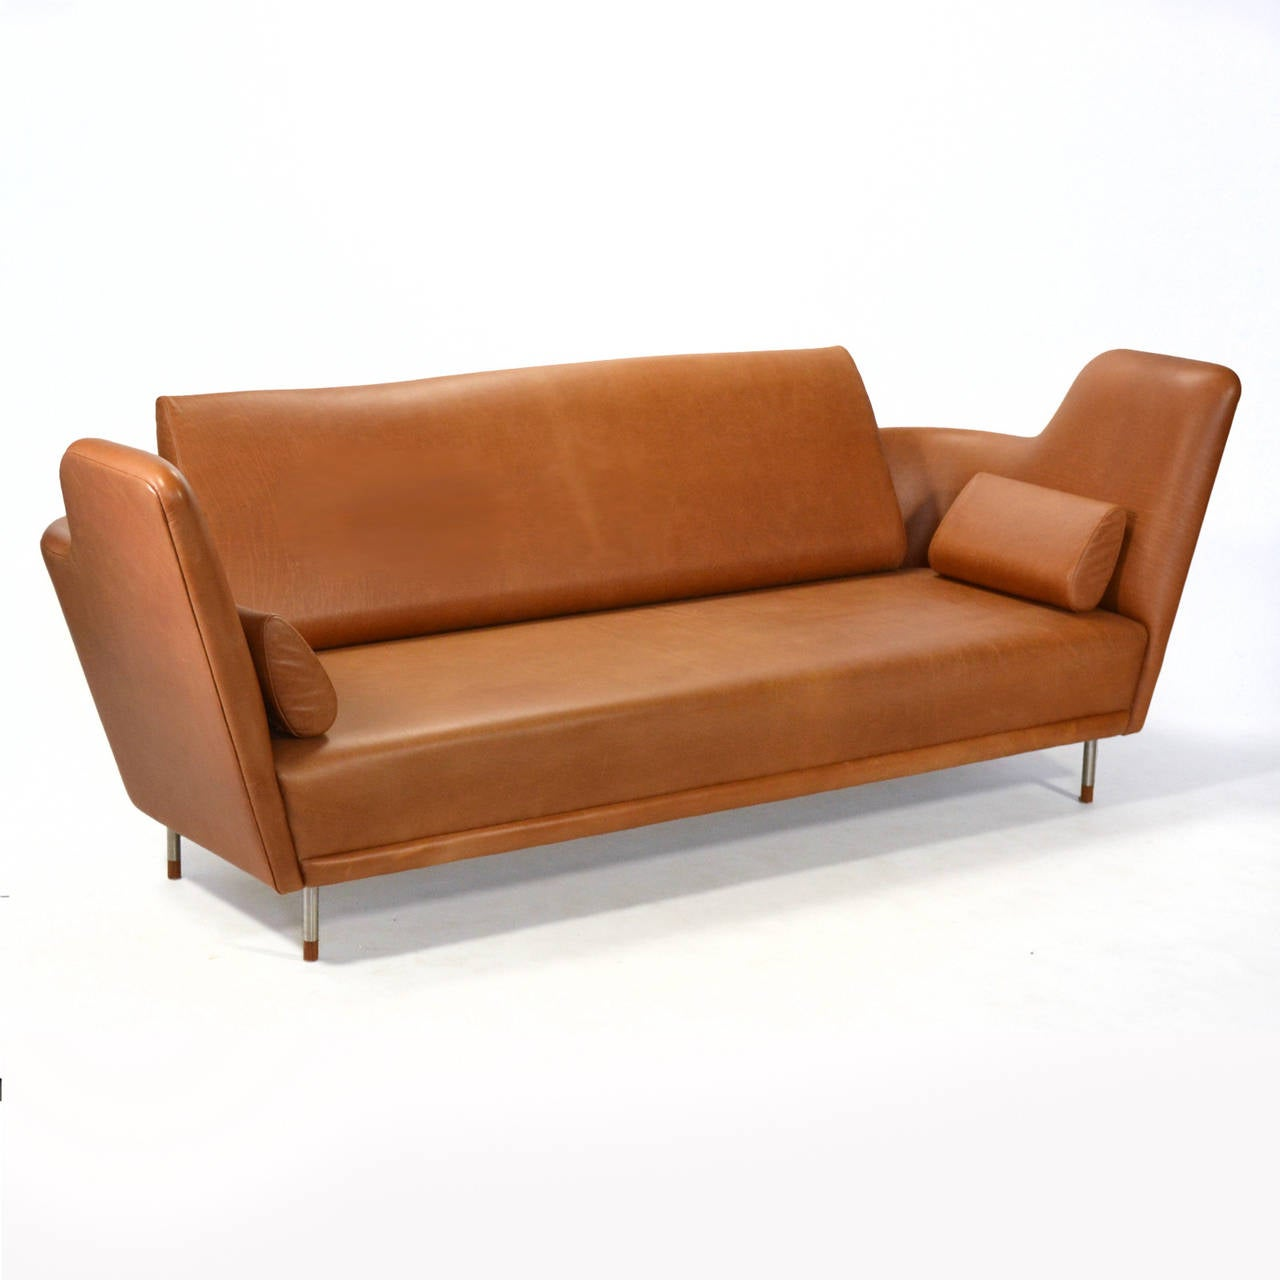 finn juhl model 57 tivoli sofa at 1stdibs. Black Bedroom Furniture Sets. Home Design Ideas